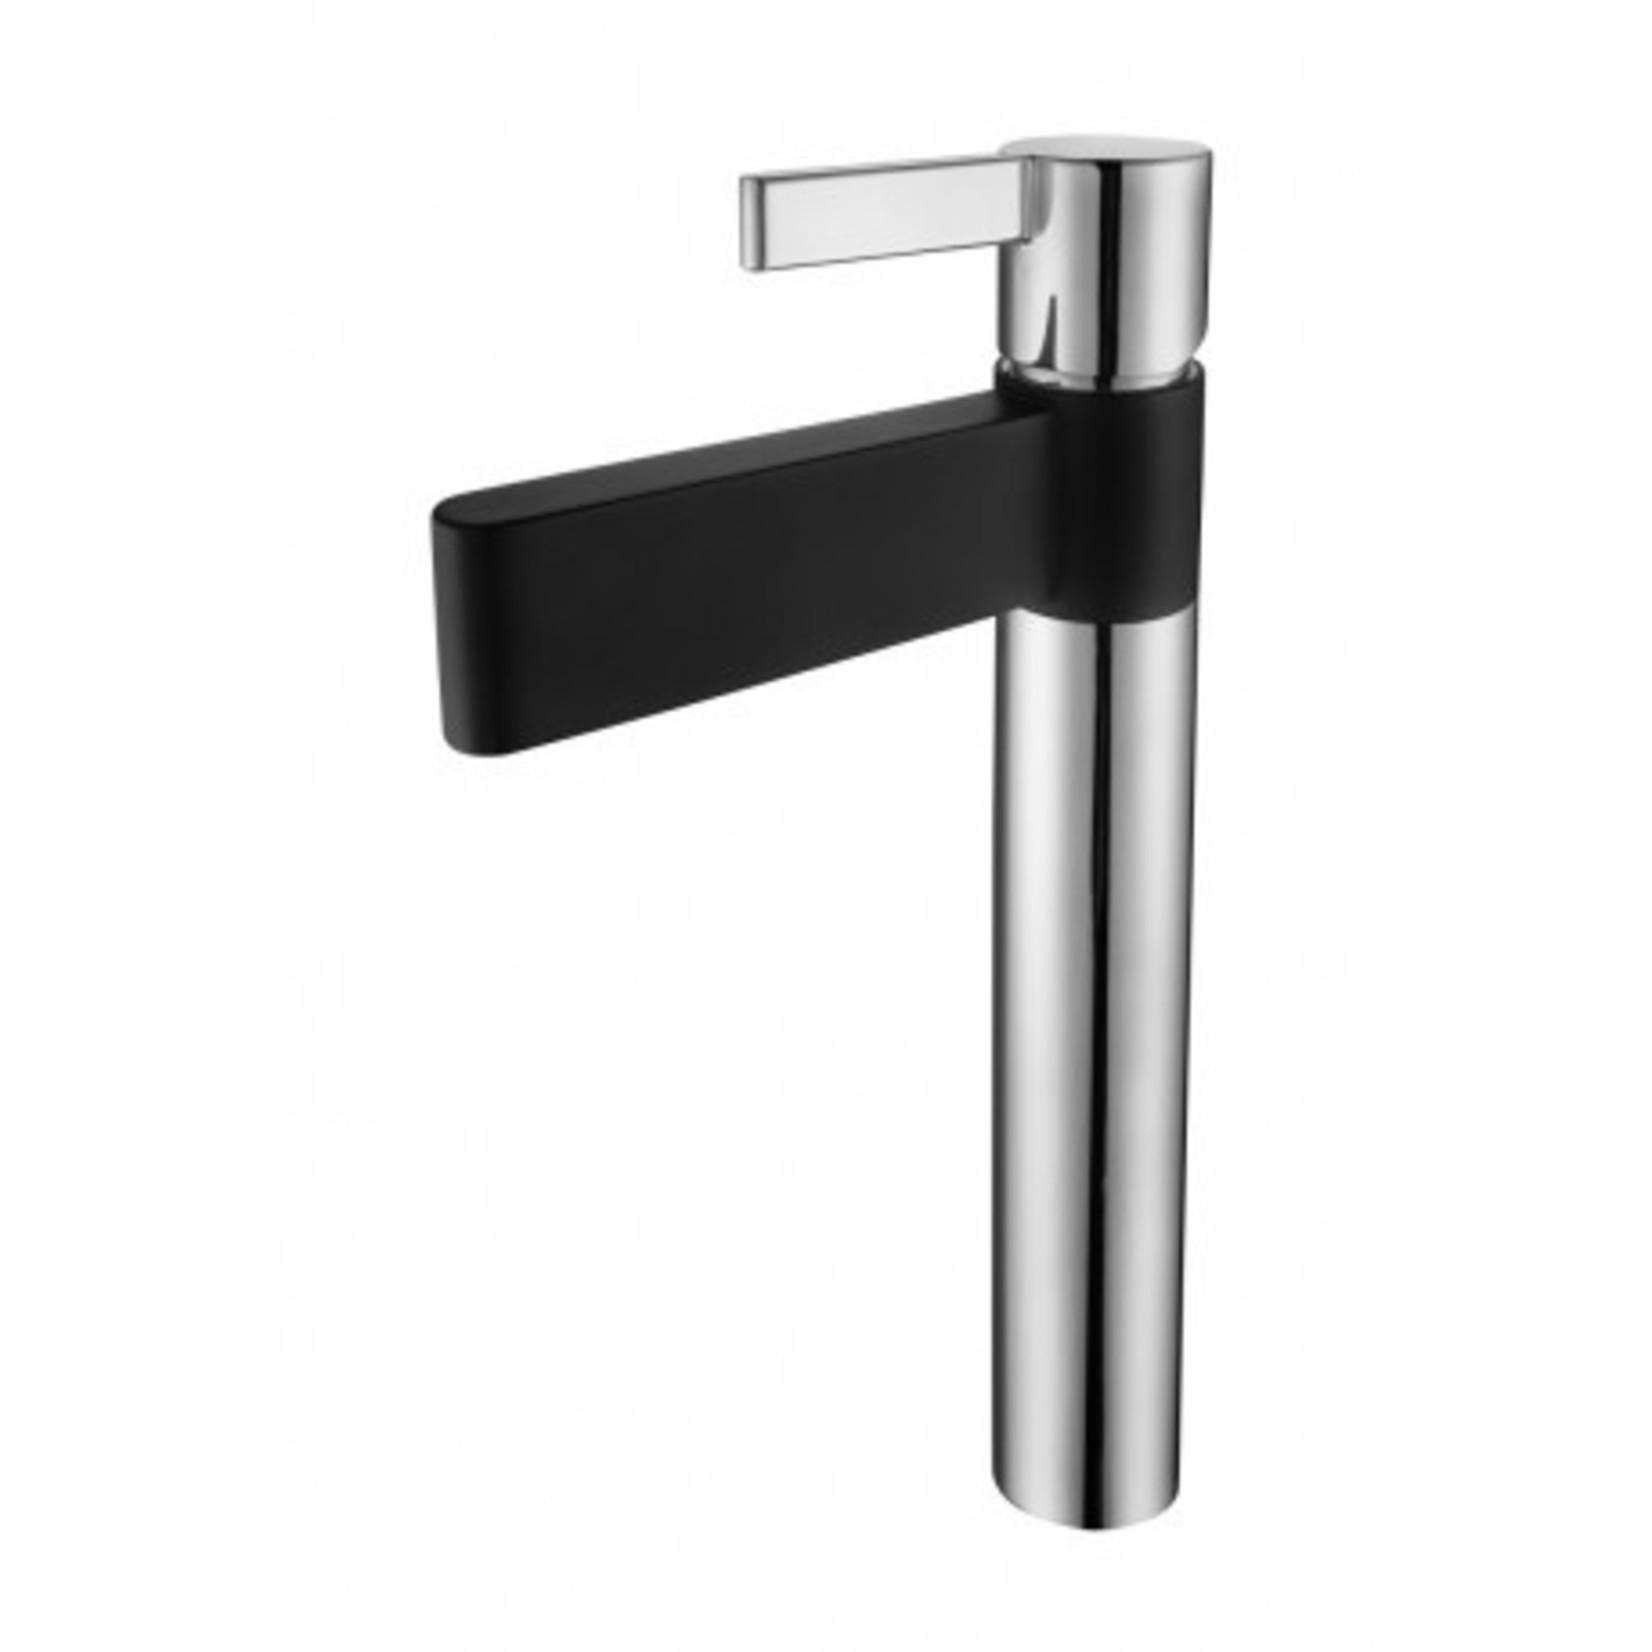 Washbasin tap 2512 Chrome / Black